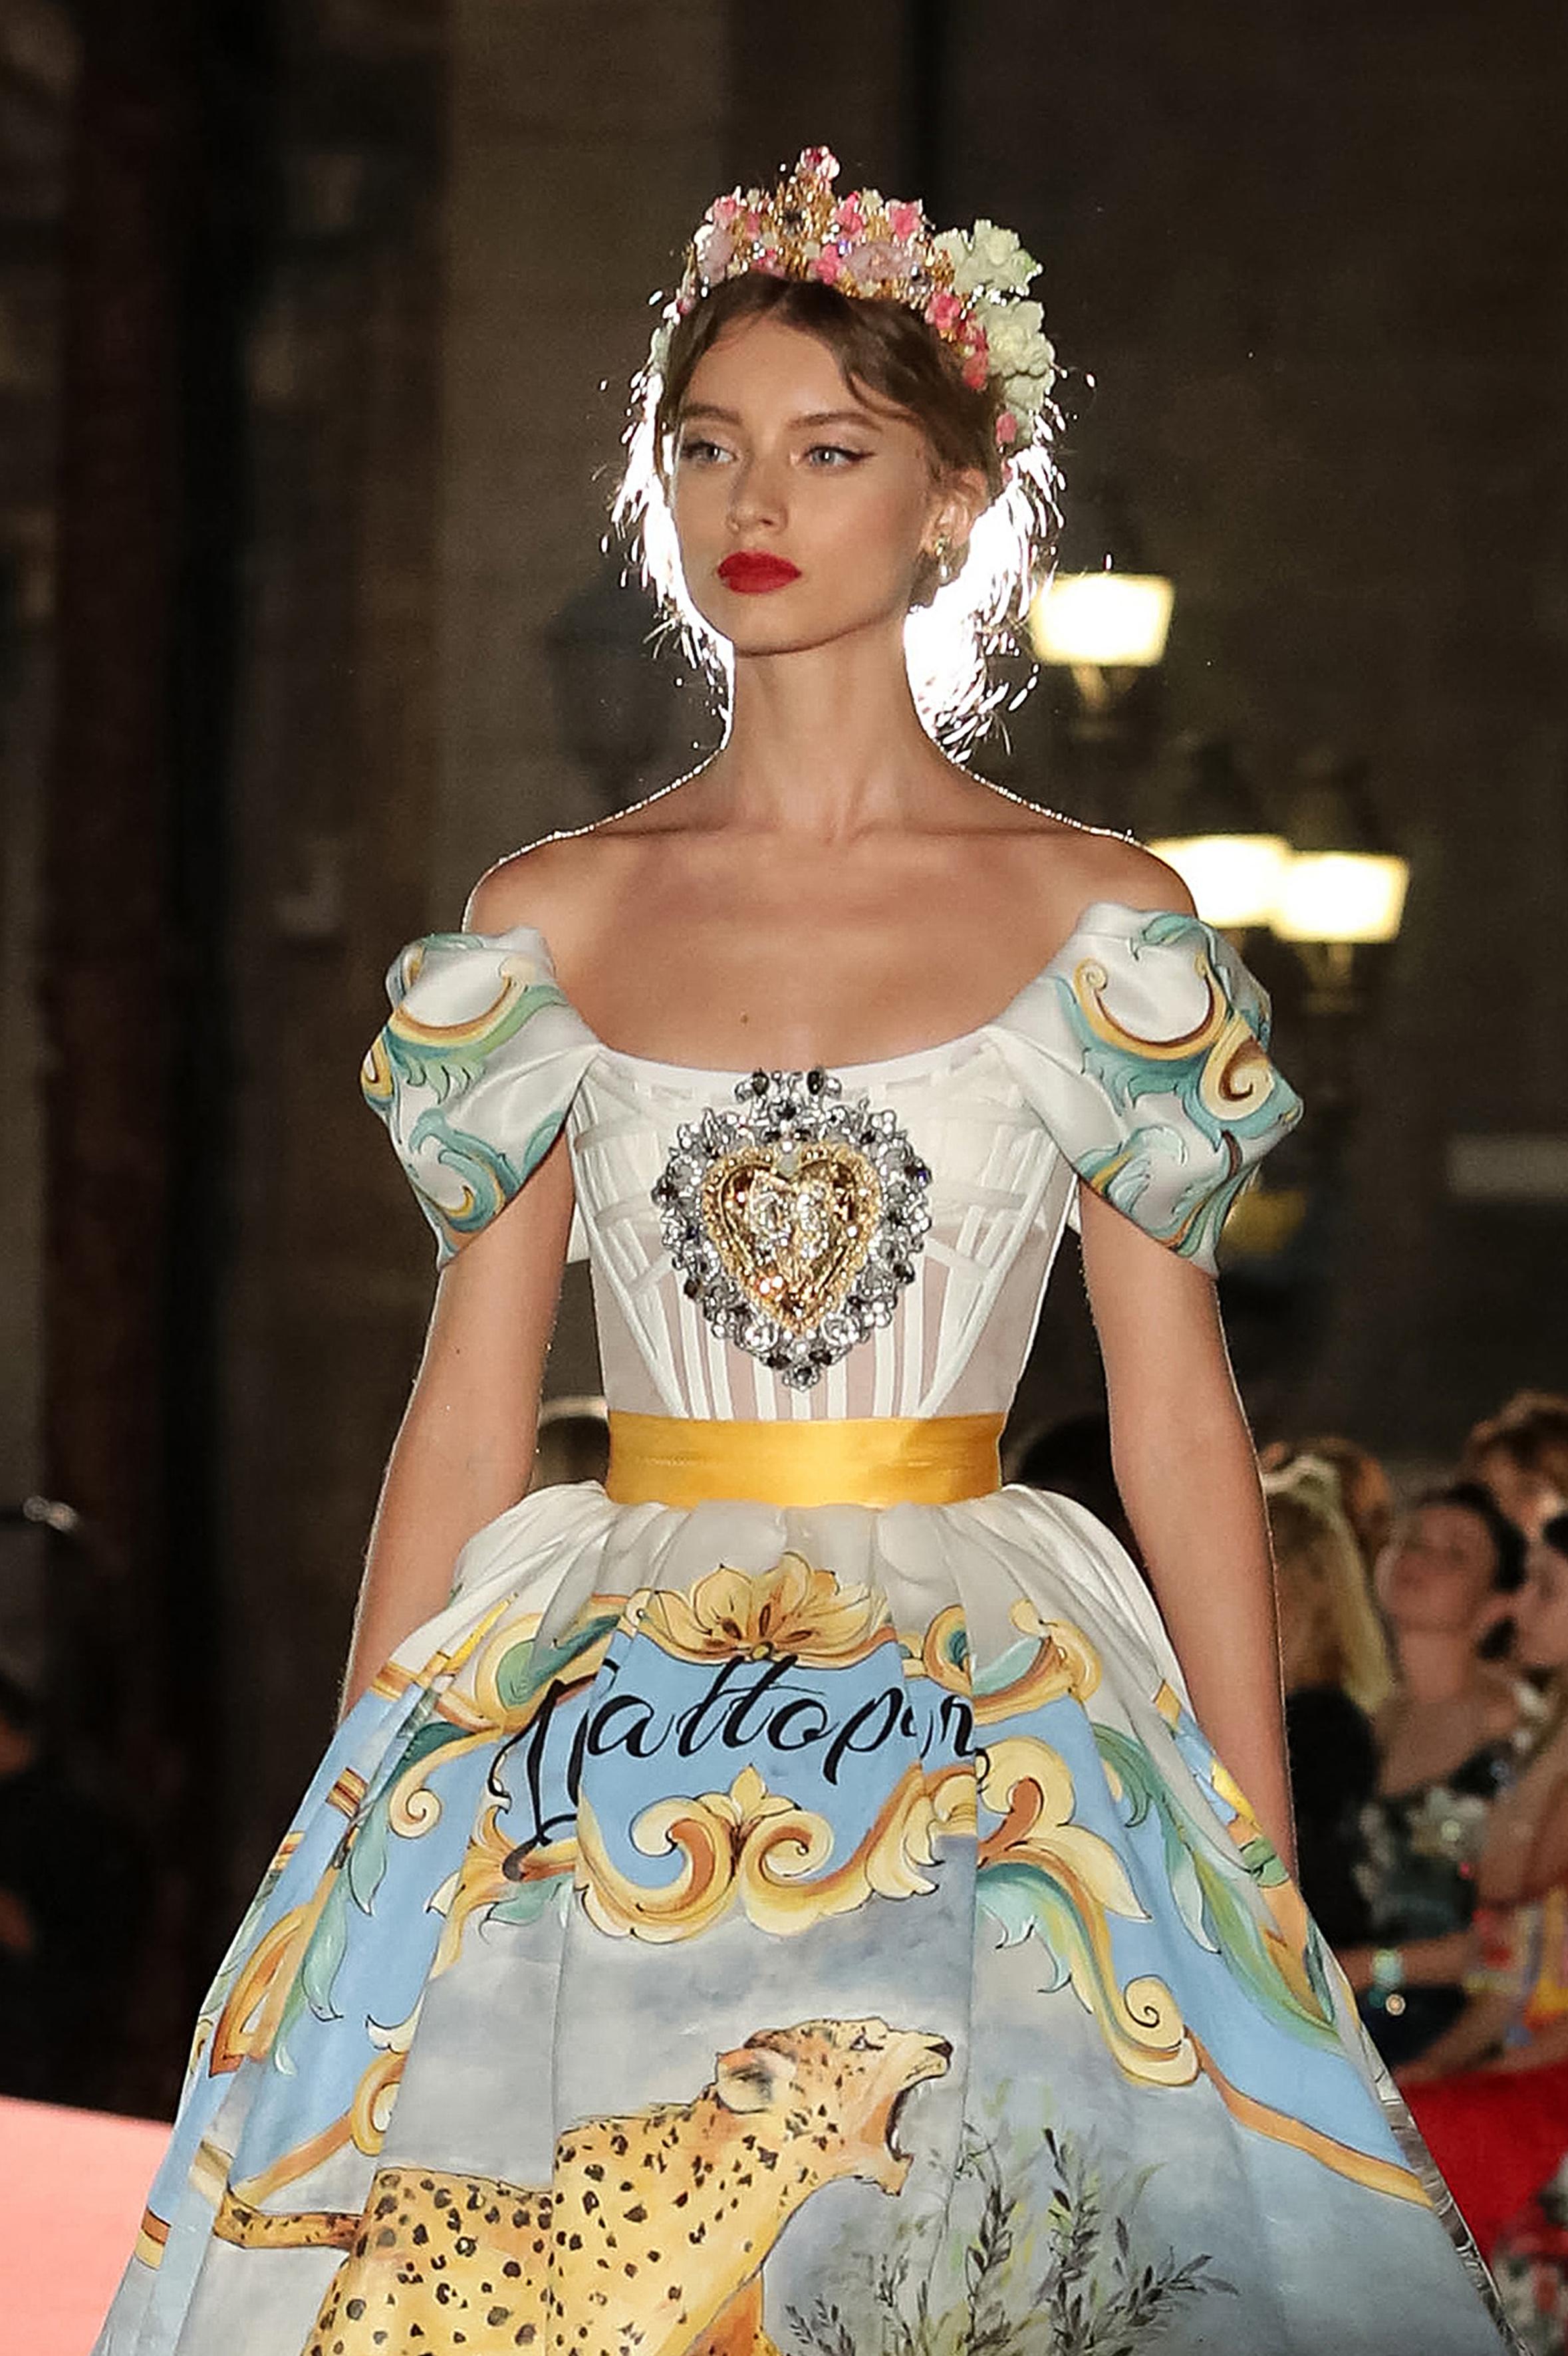 539f55675e Dolce & Gabbana's ode to Sicily - CNN Video